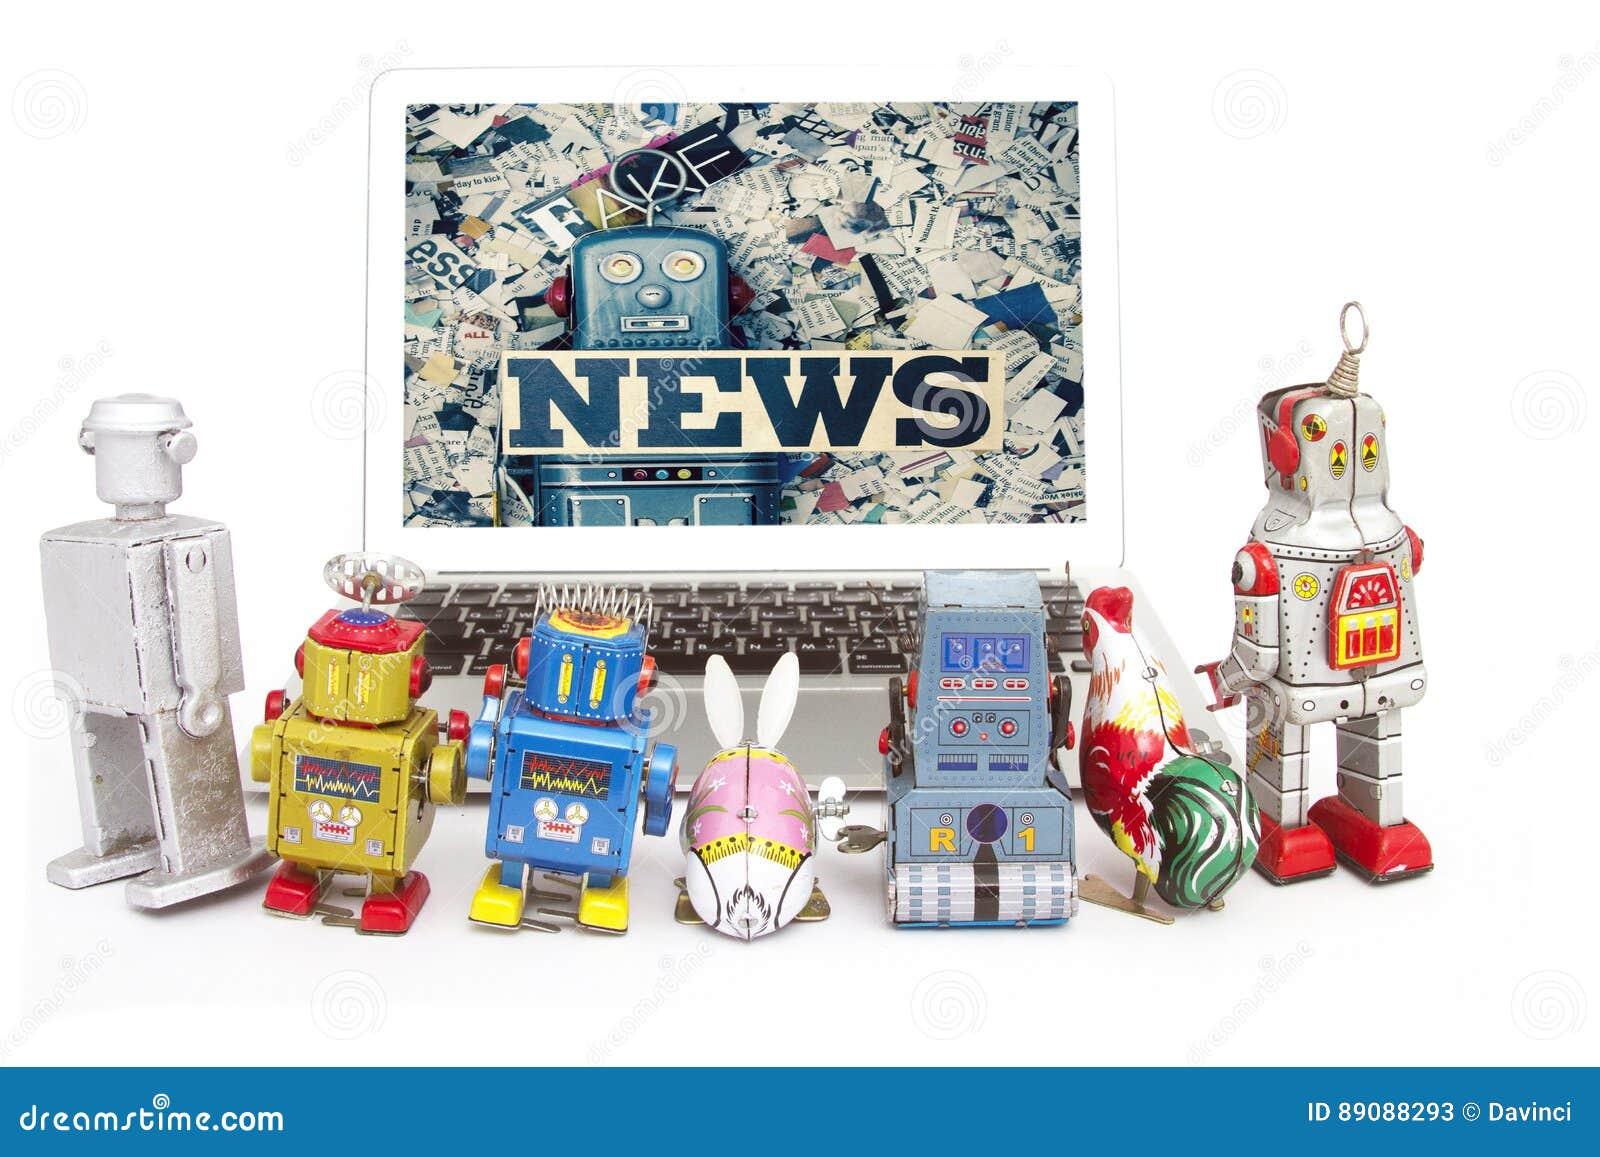 Fake news stock image  Image of robotic, fraud, newspaper